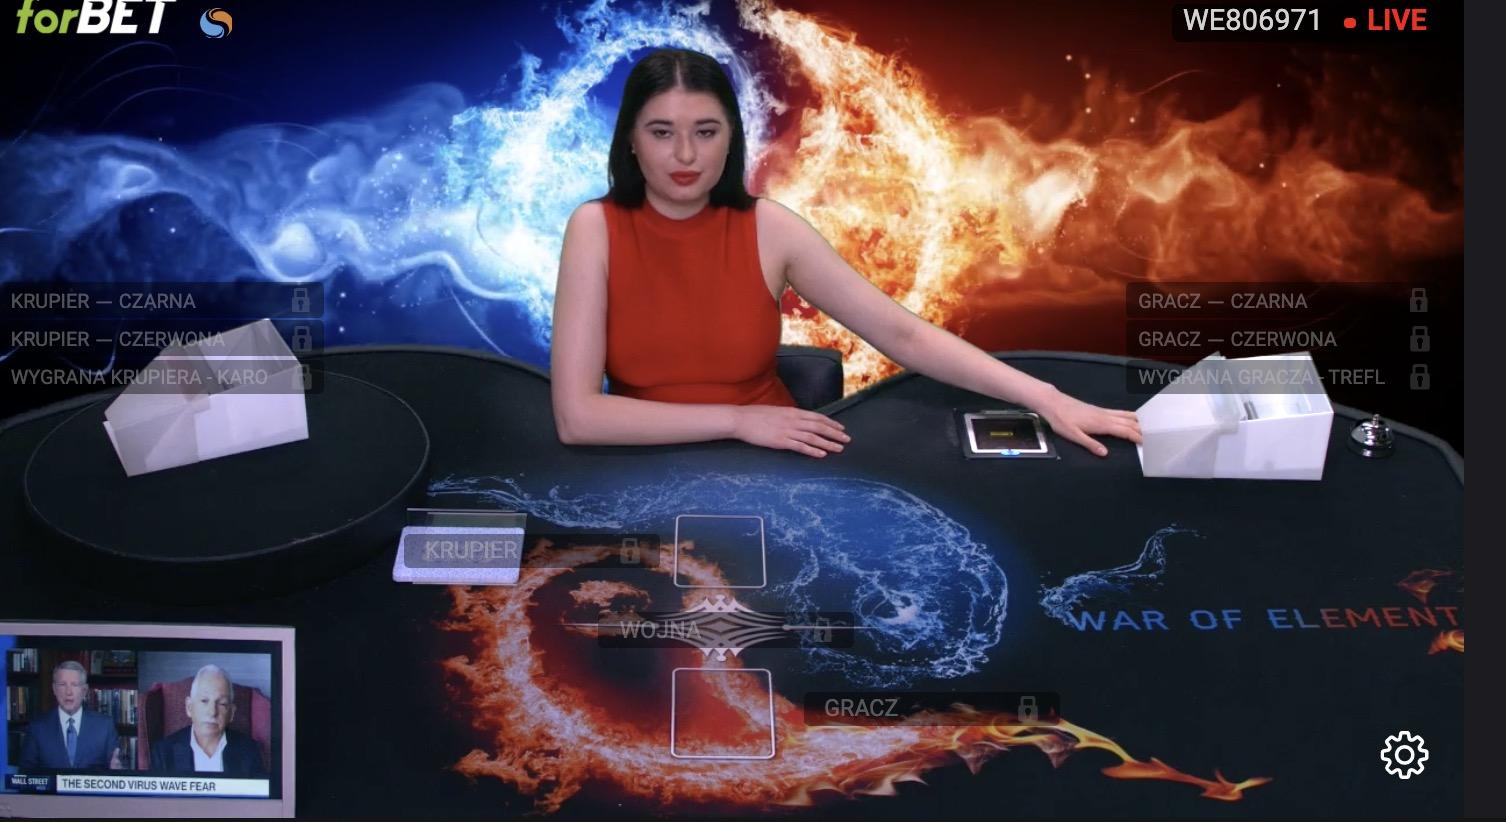 Legalny Poker w Forbet. TvBET to także Blackjack oraz Wojna!